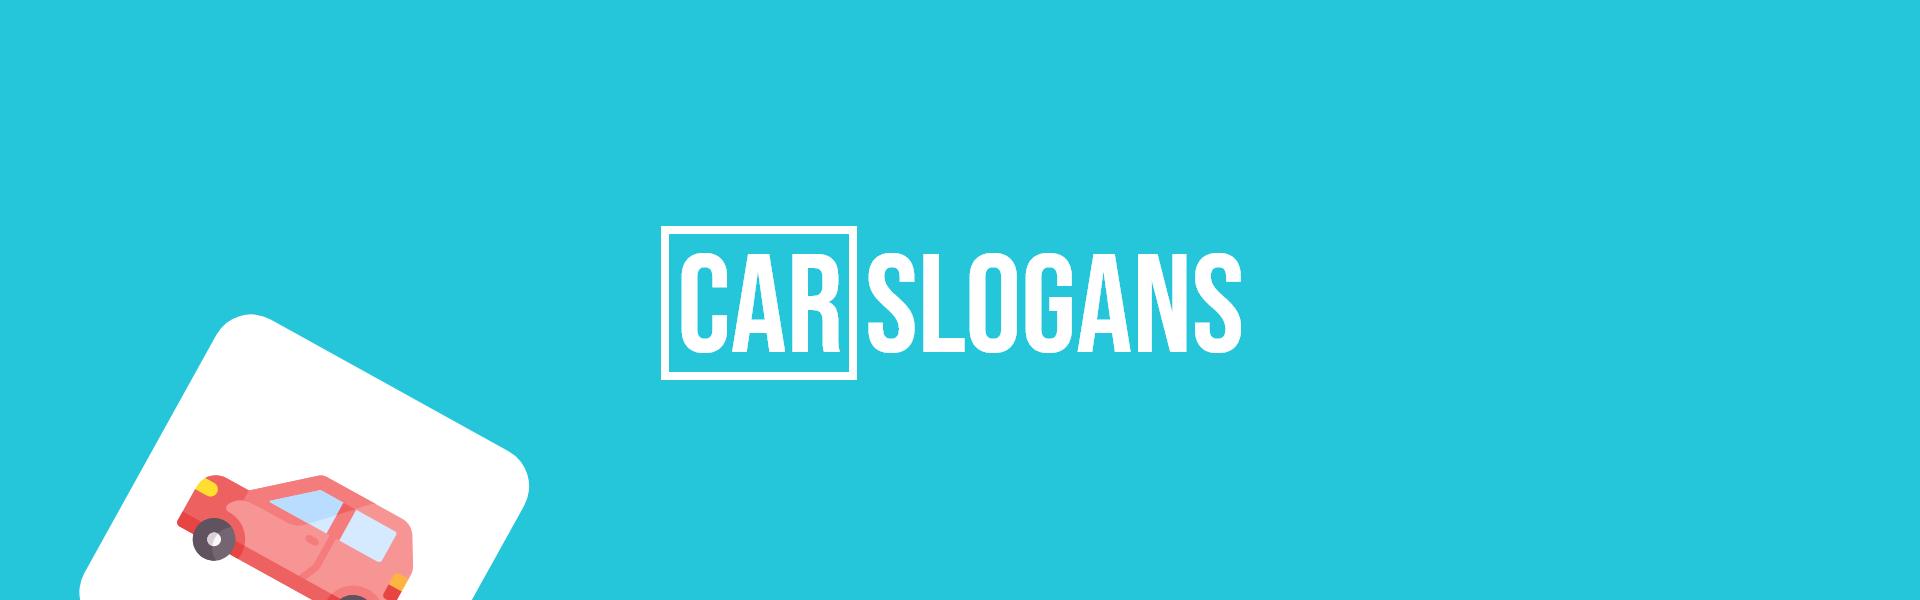 car slogans taglines